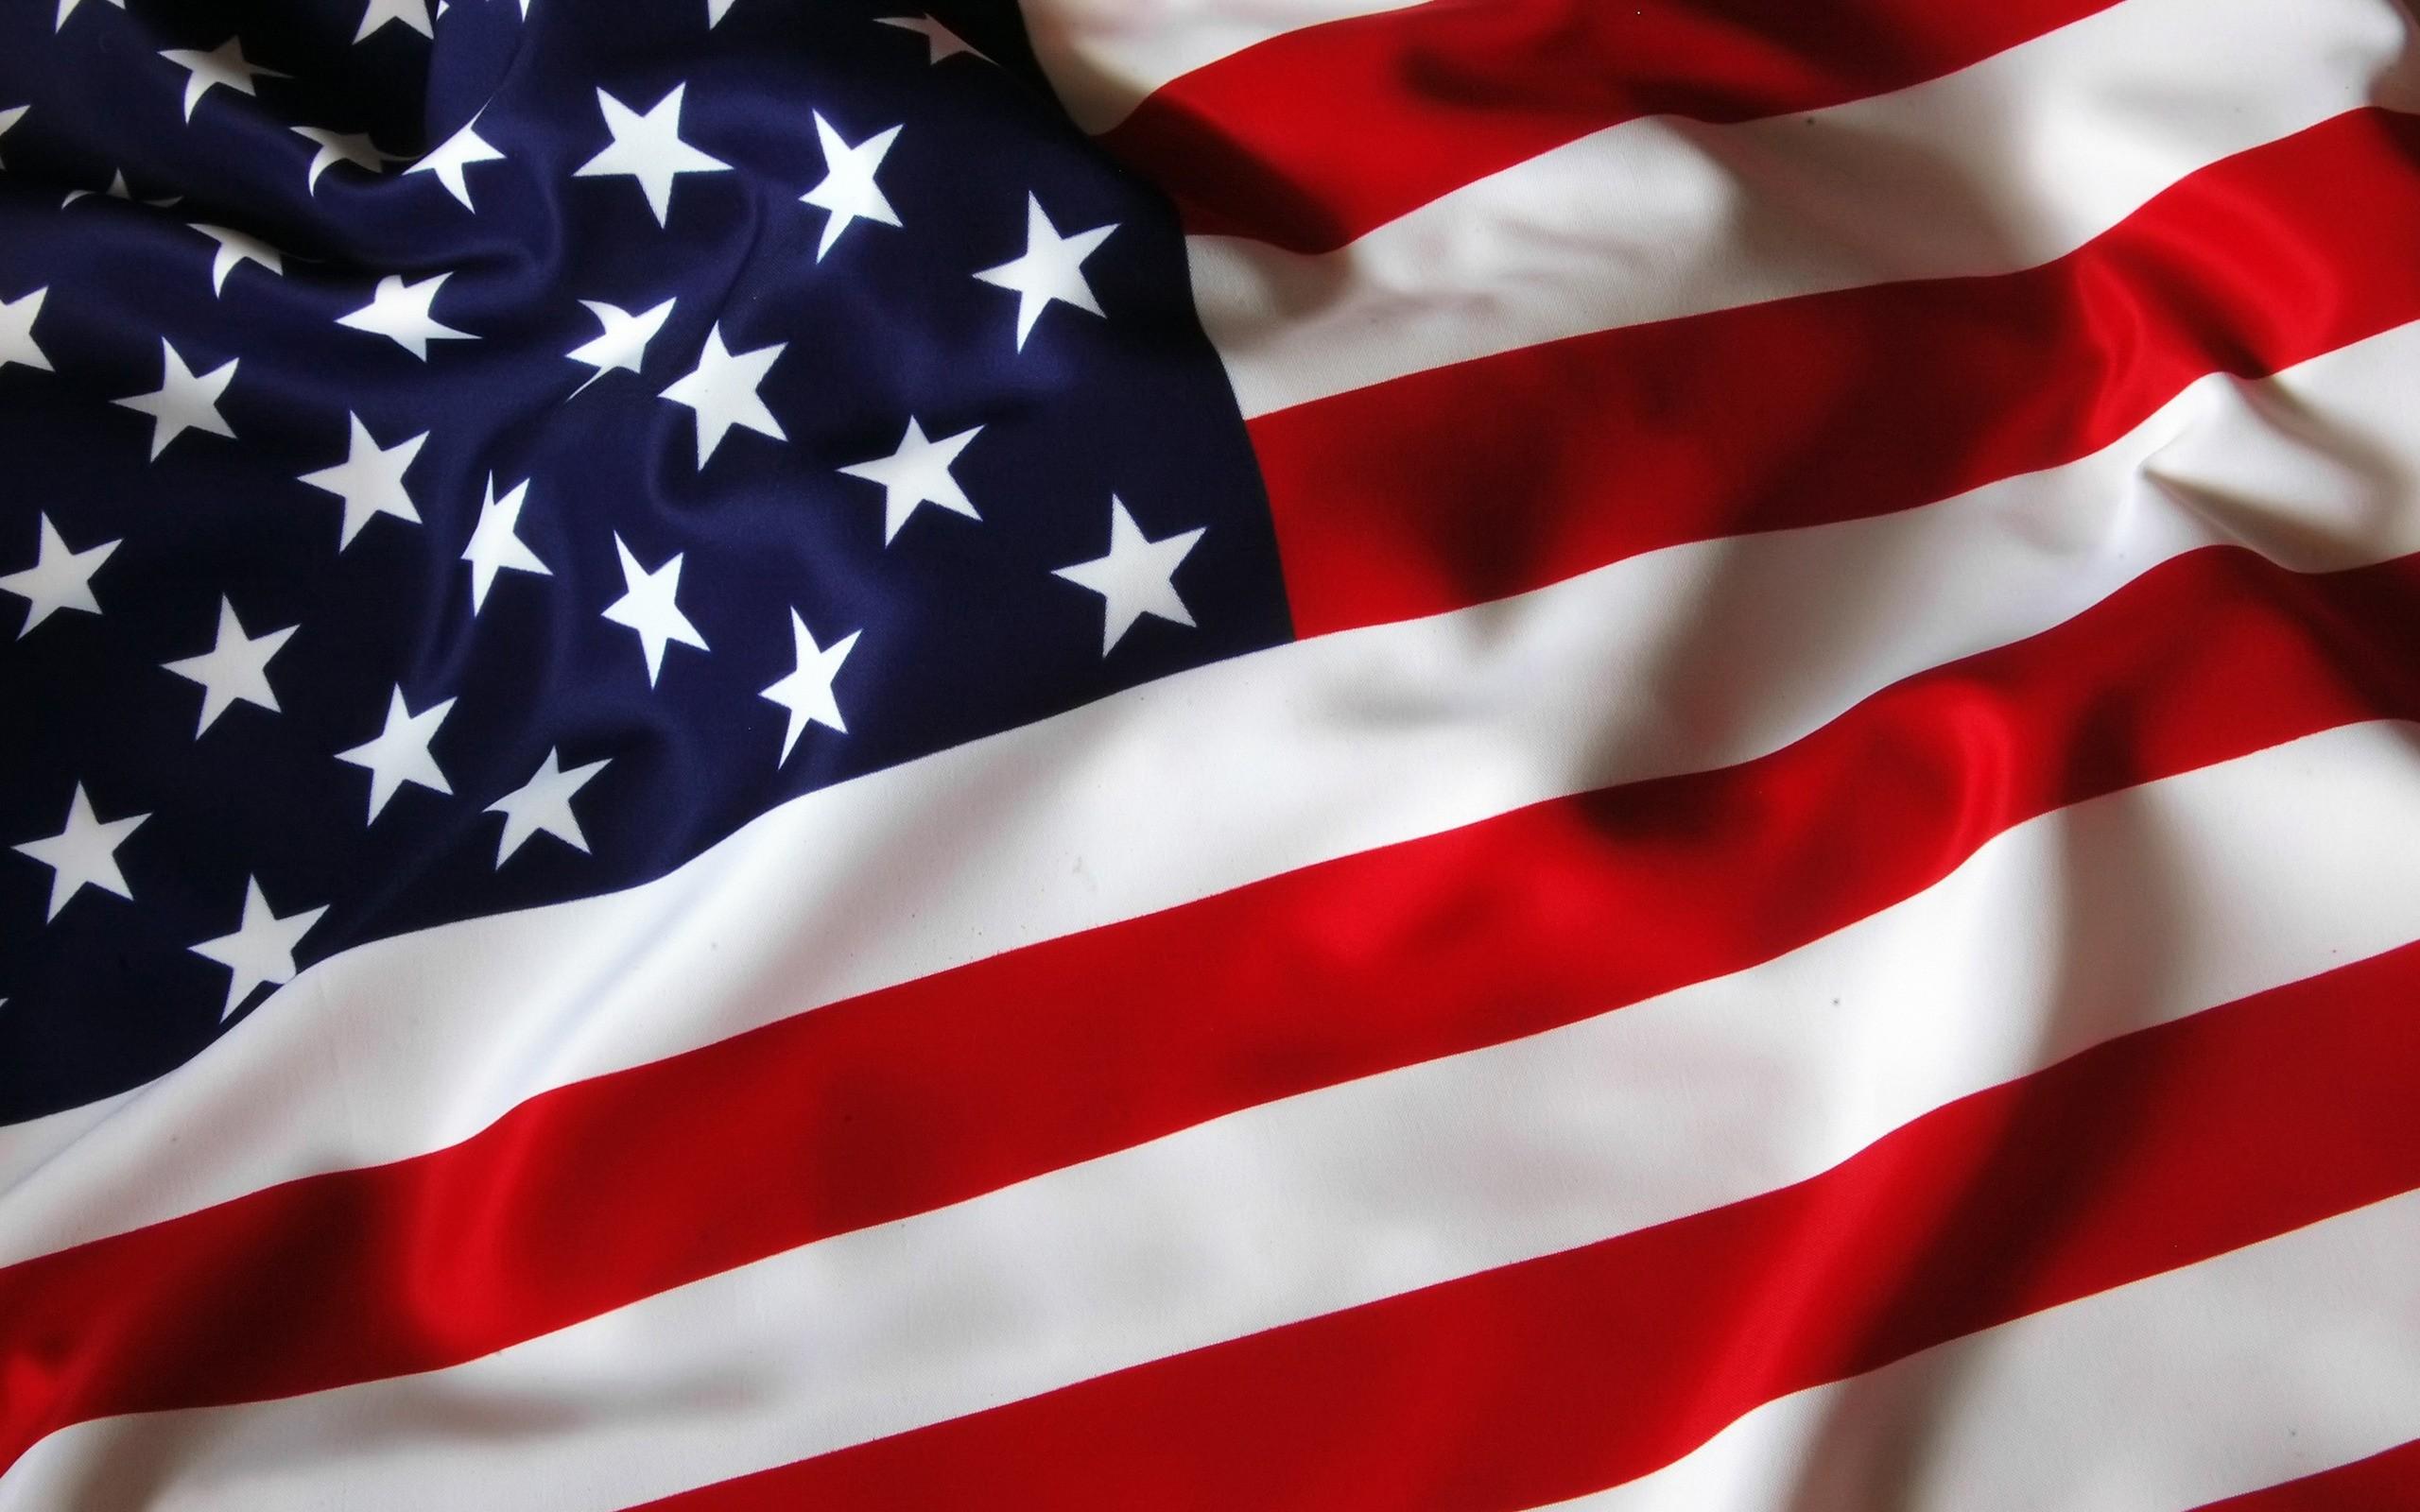 Flags USA Wallpaper 2560x1600 Flags USA National 2560x1600